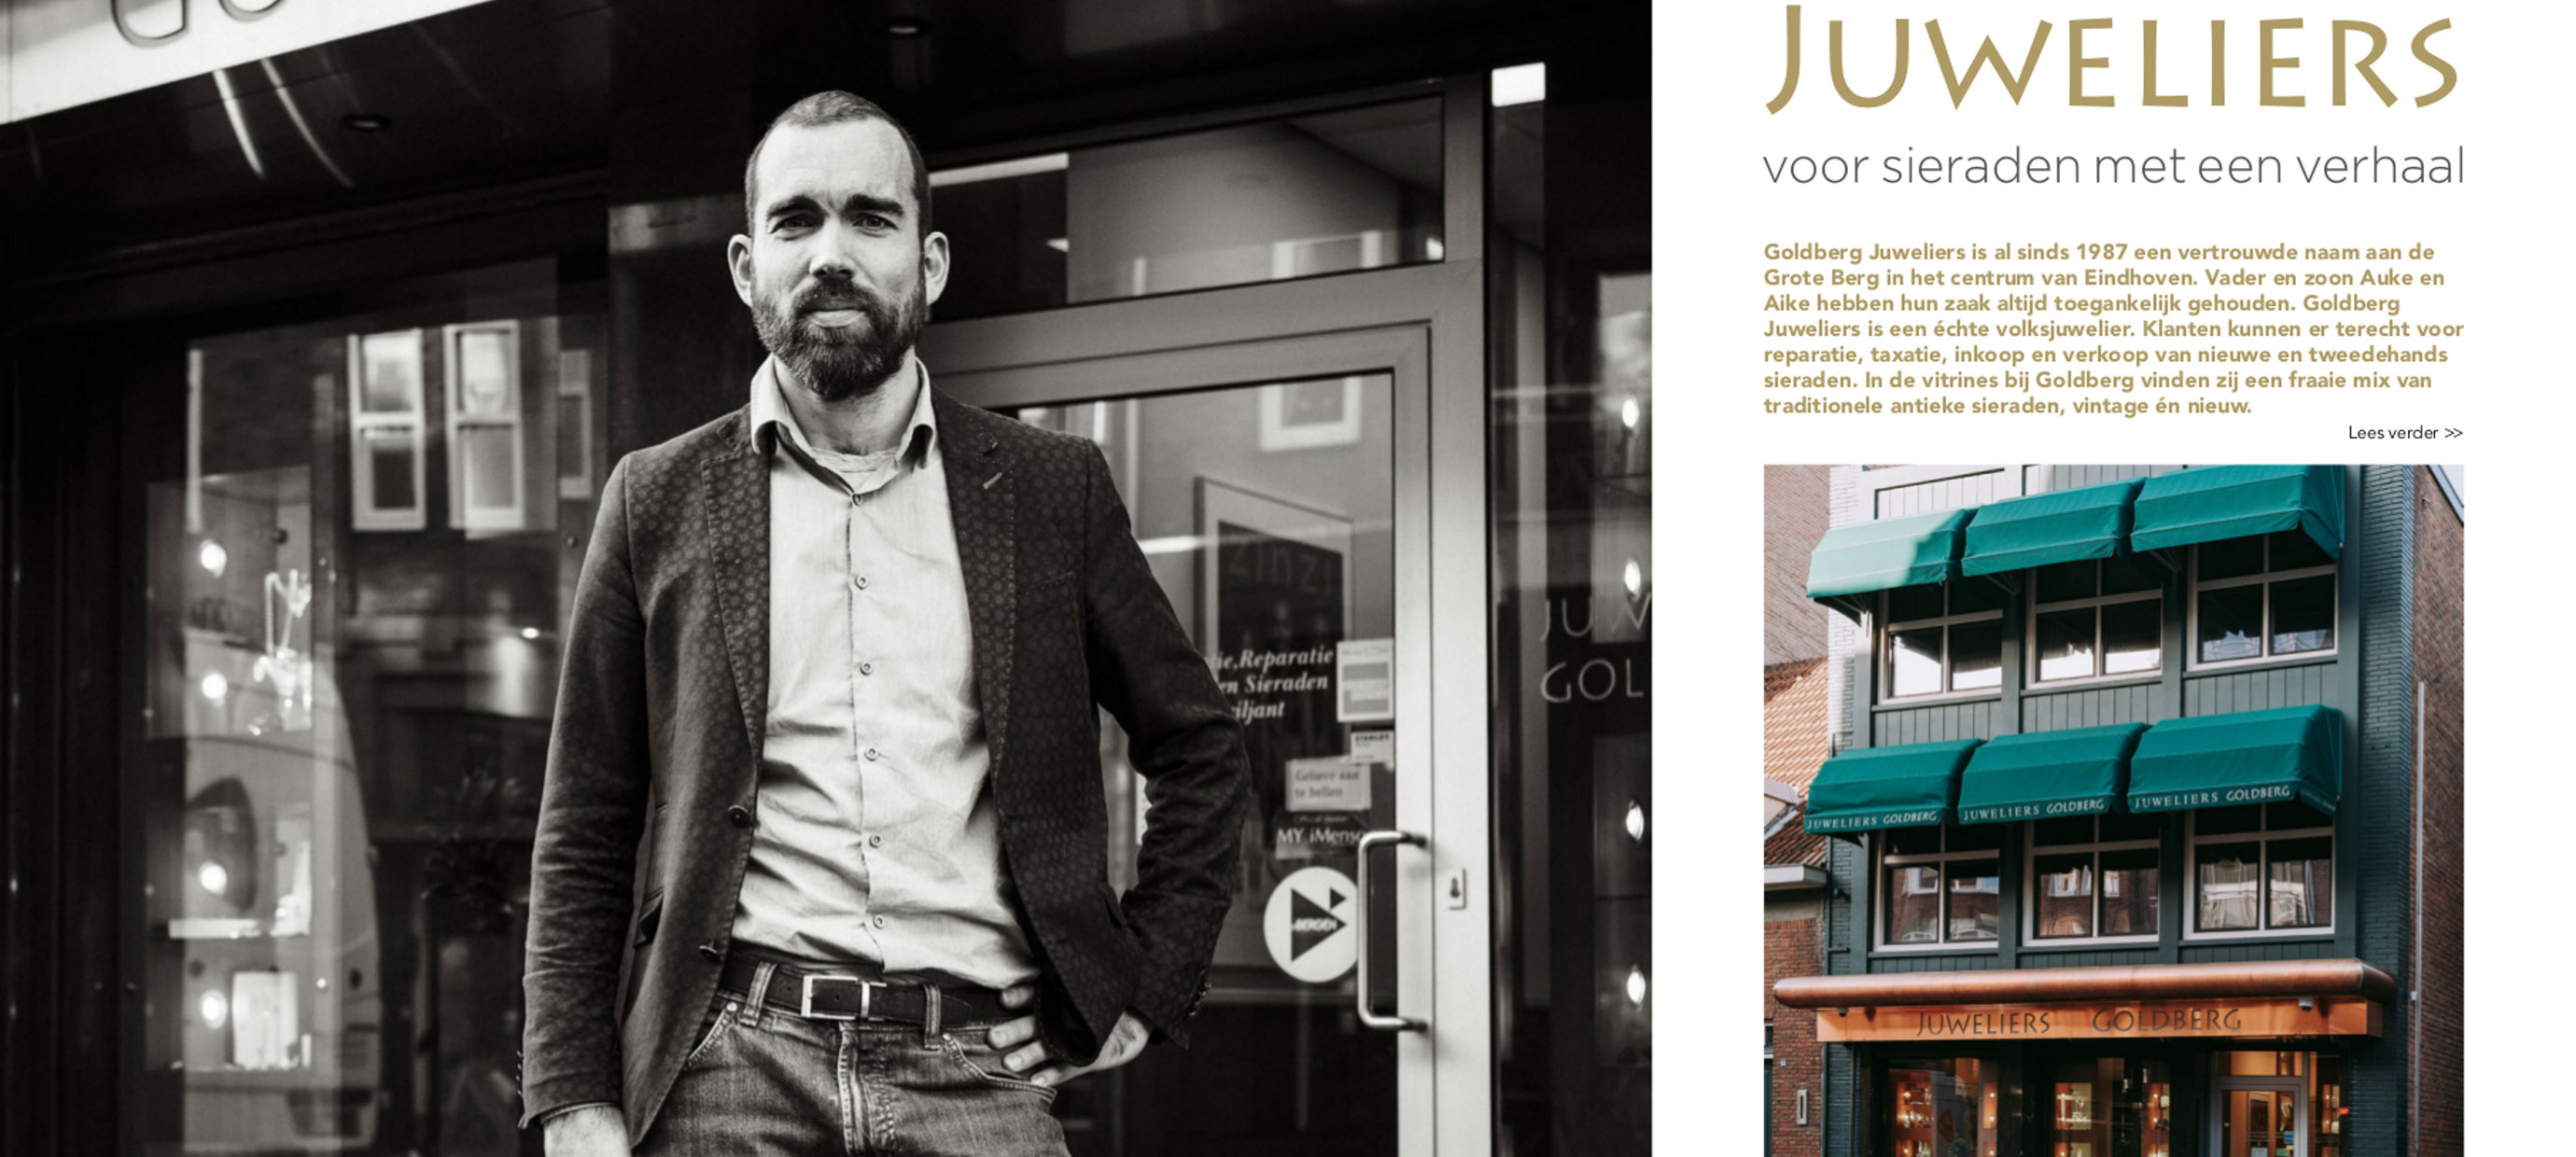 Artikel Goldberg Juweliers in Eindhoven Business